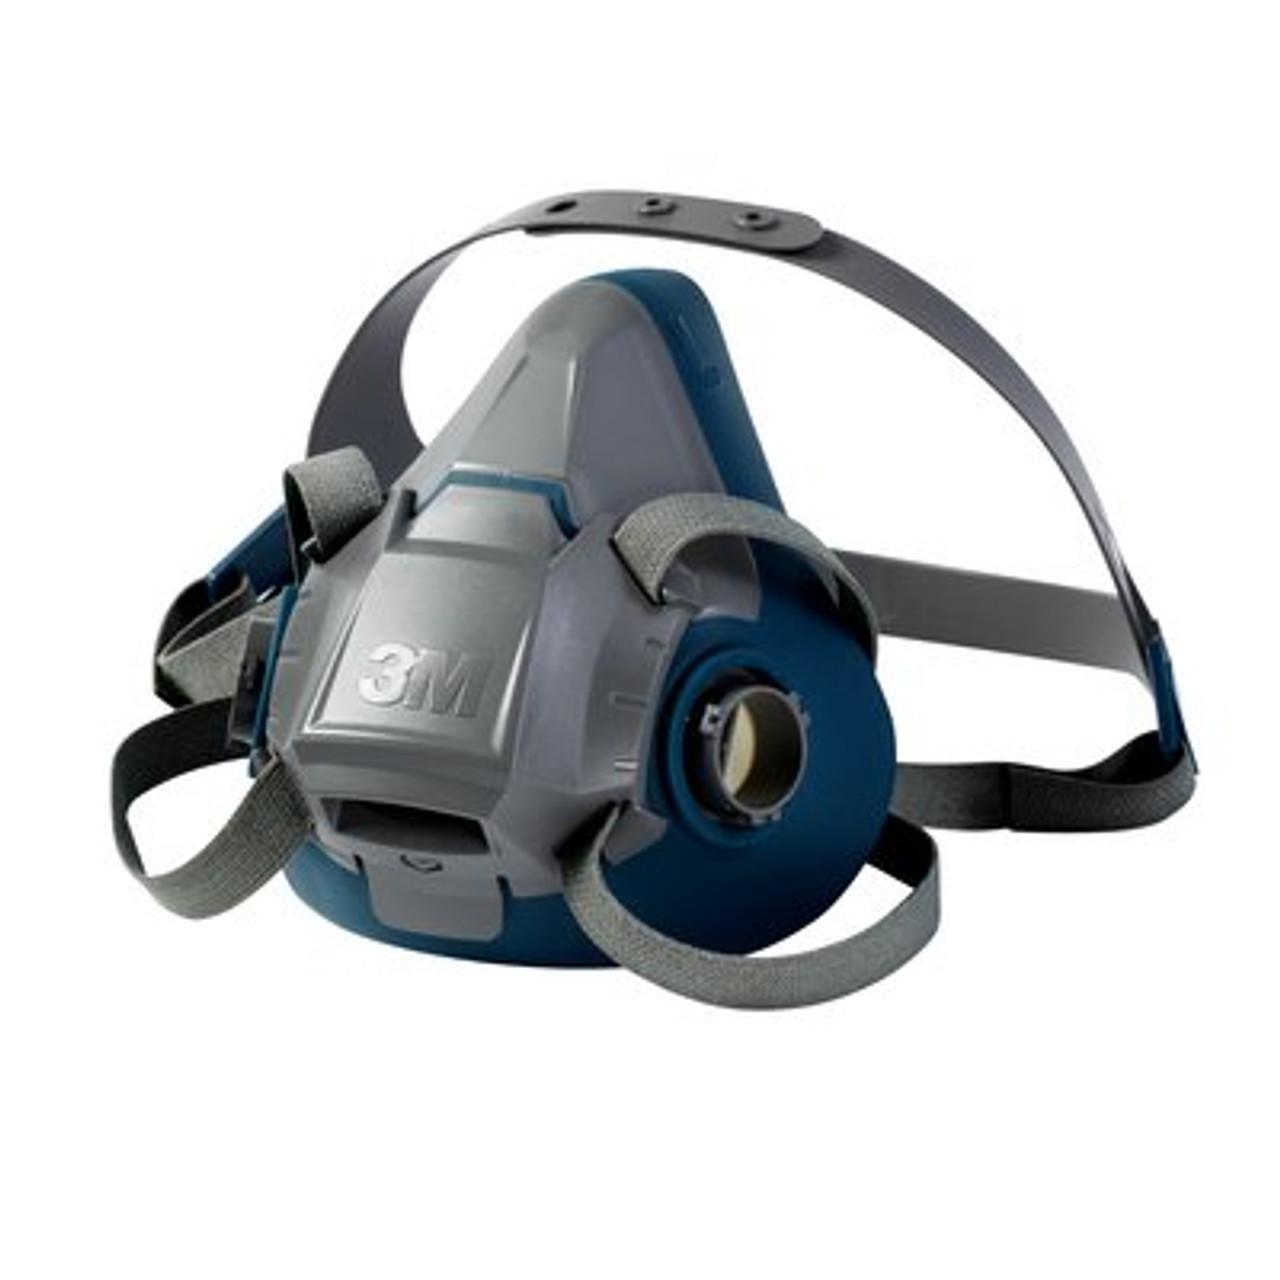 3m mask respirator